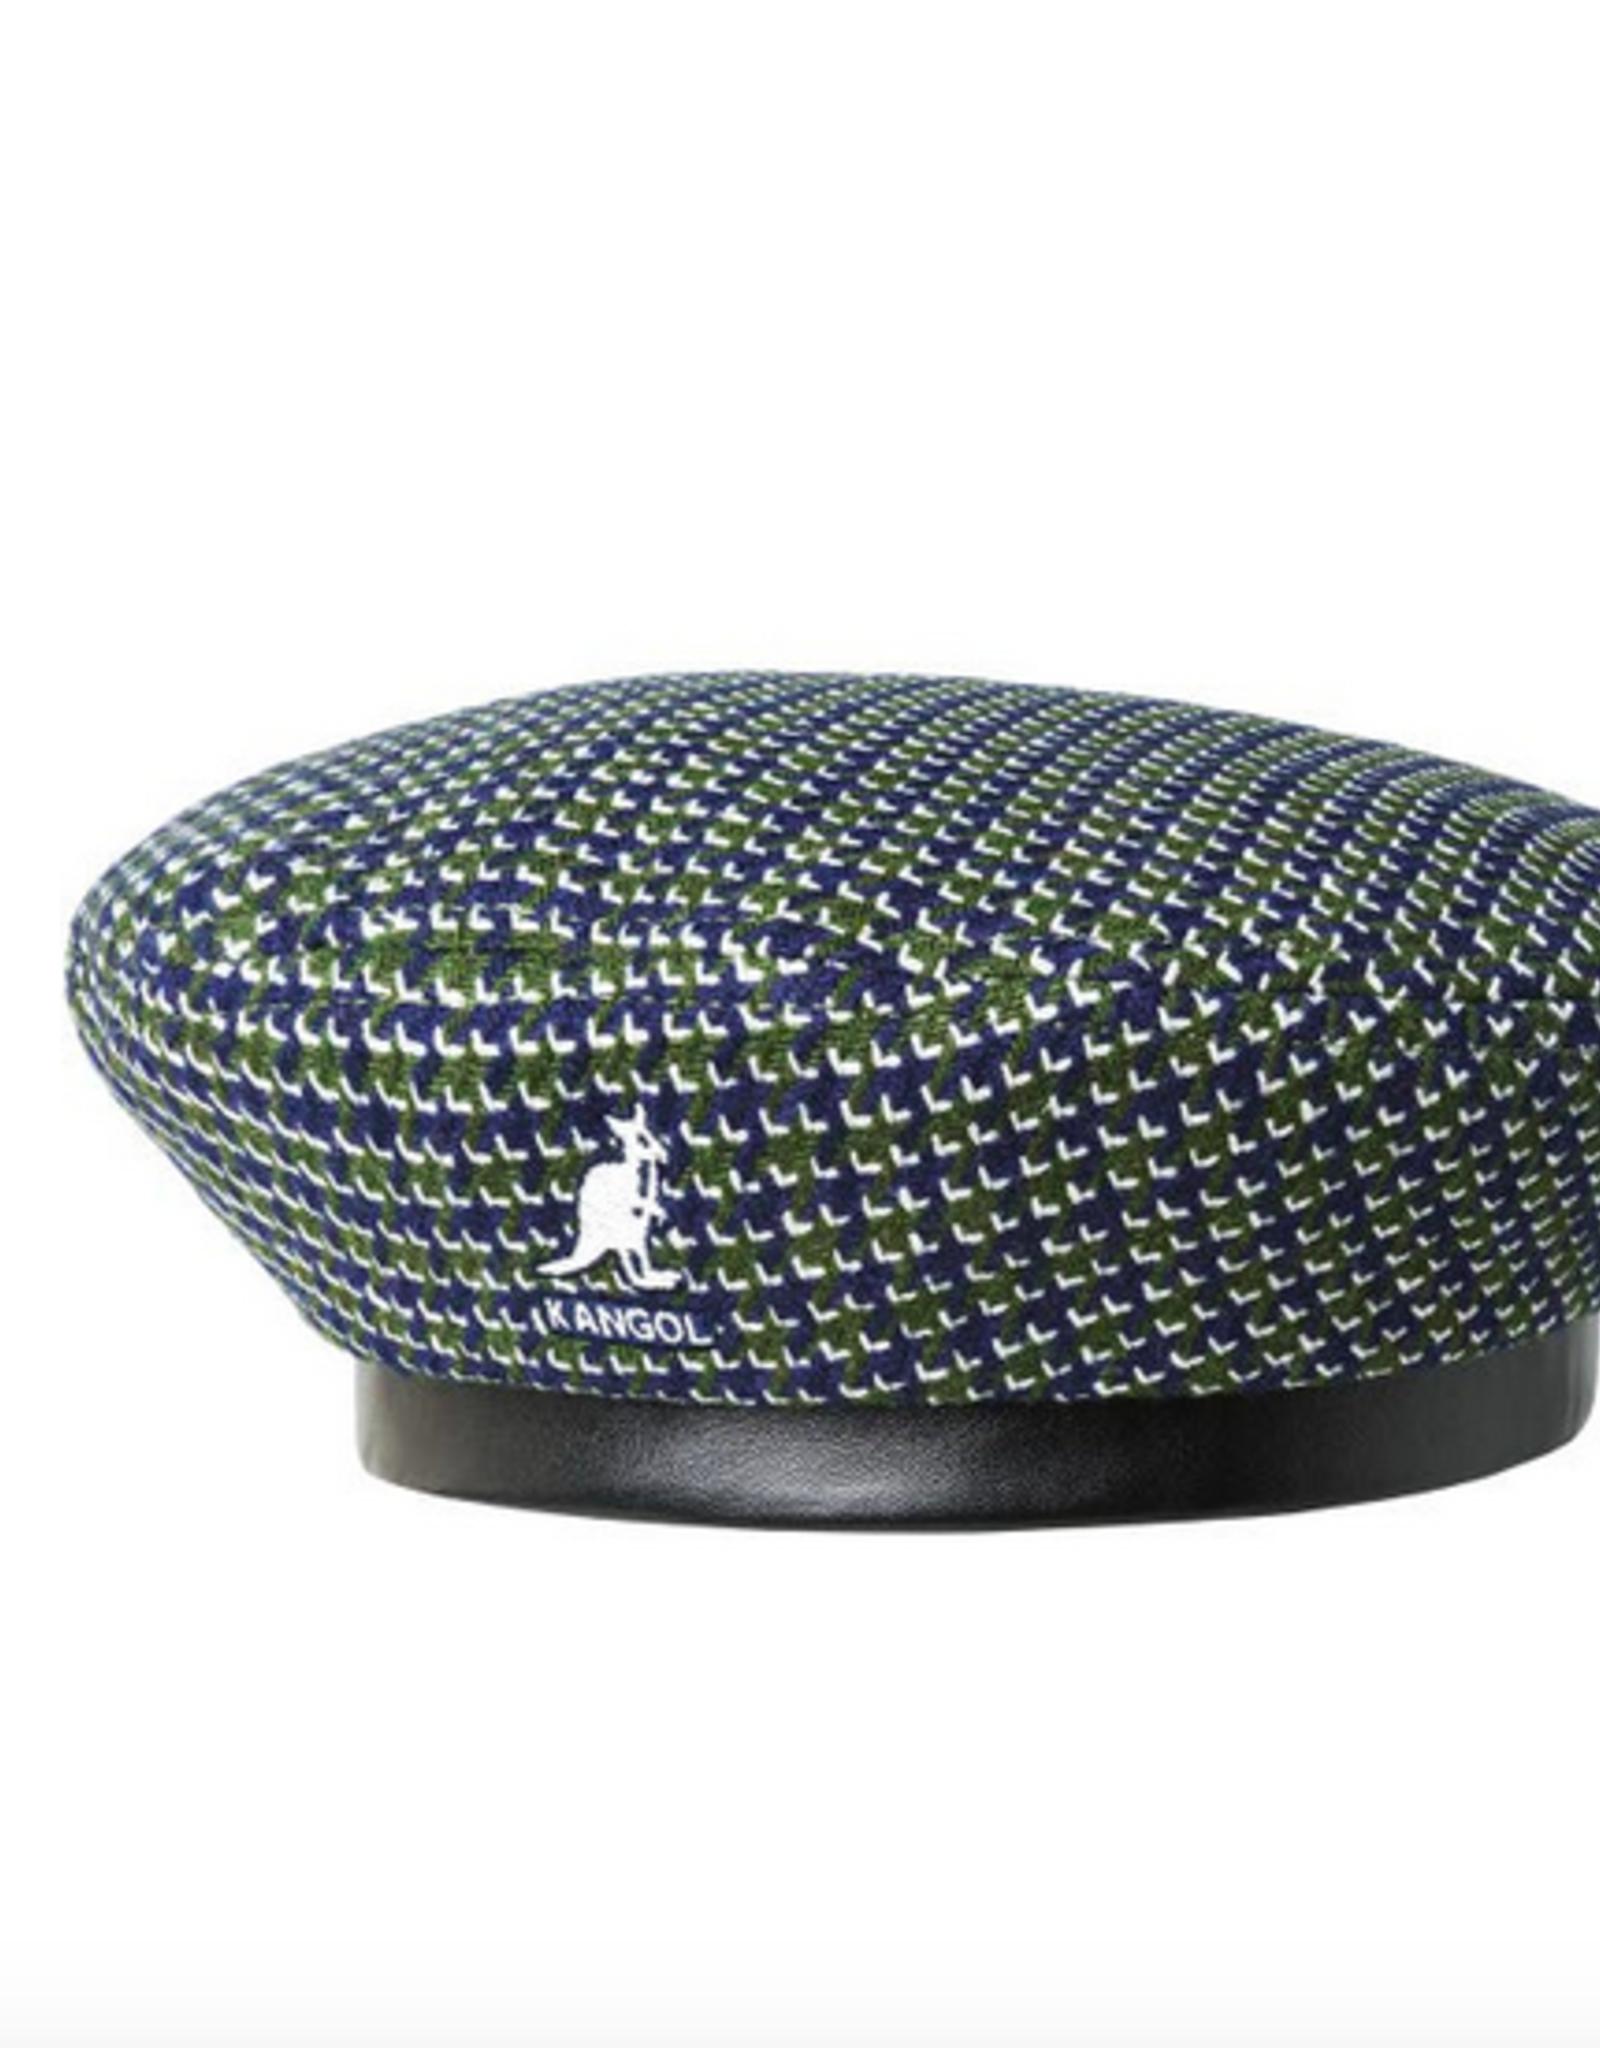 kangol Tooth grid beret Forest/navy L/XL